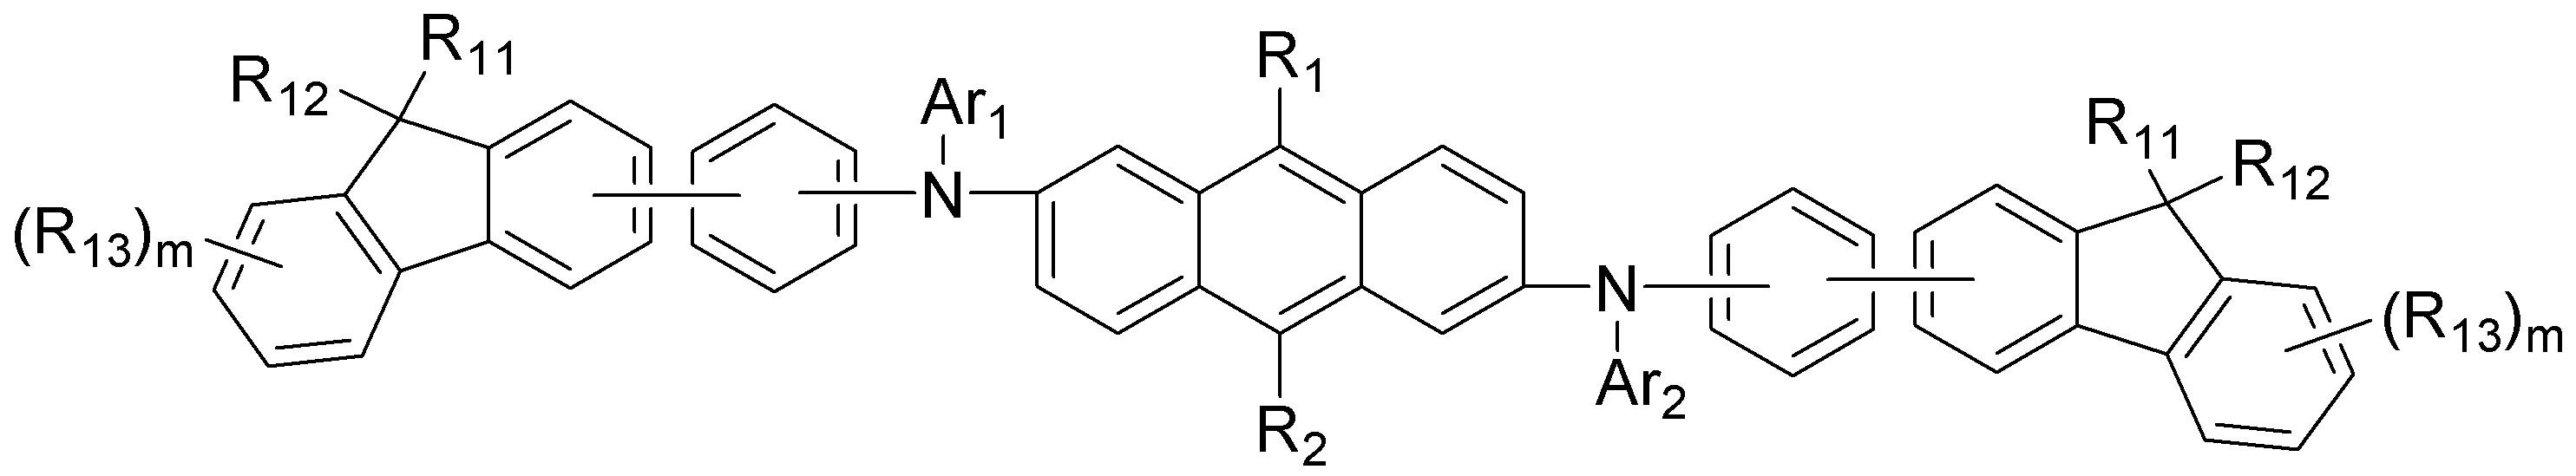 Figure 112007087103673-pat00528